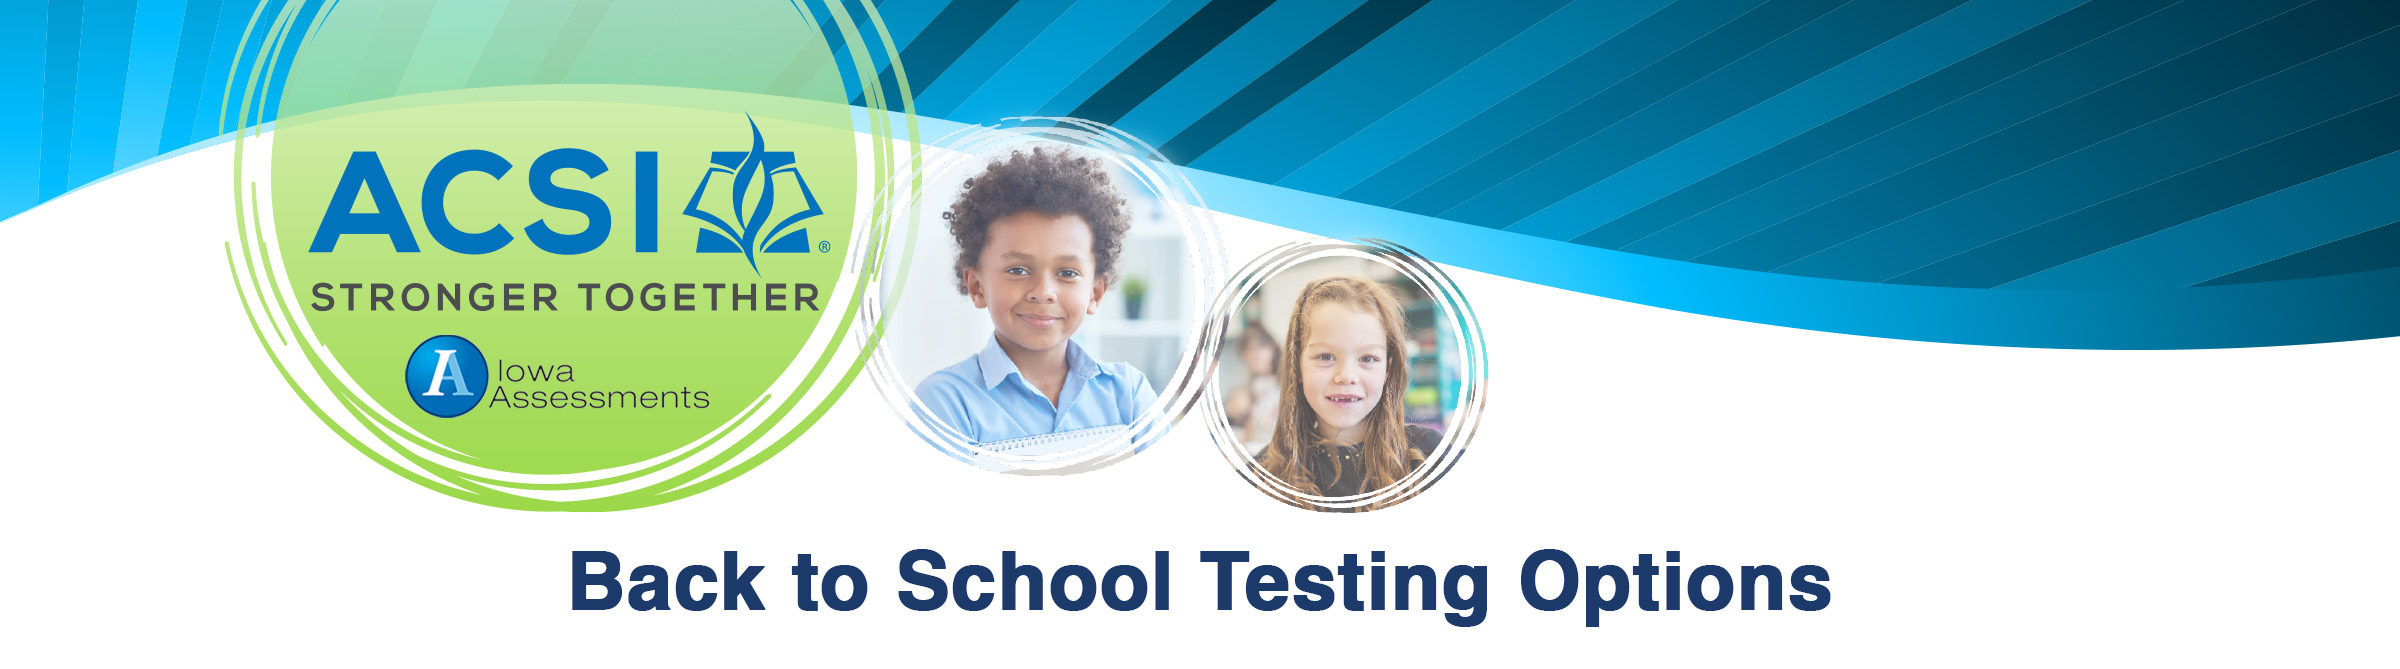 ACSI Student Assessment Program Back to School Iowa Assessment Testing Options